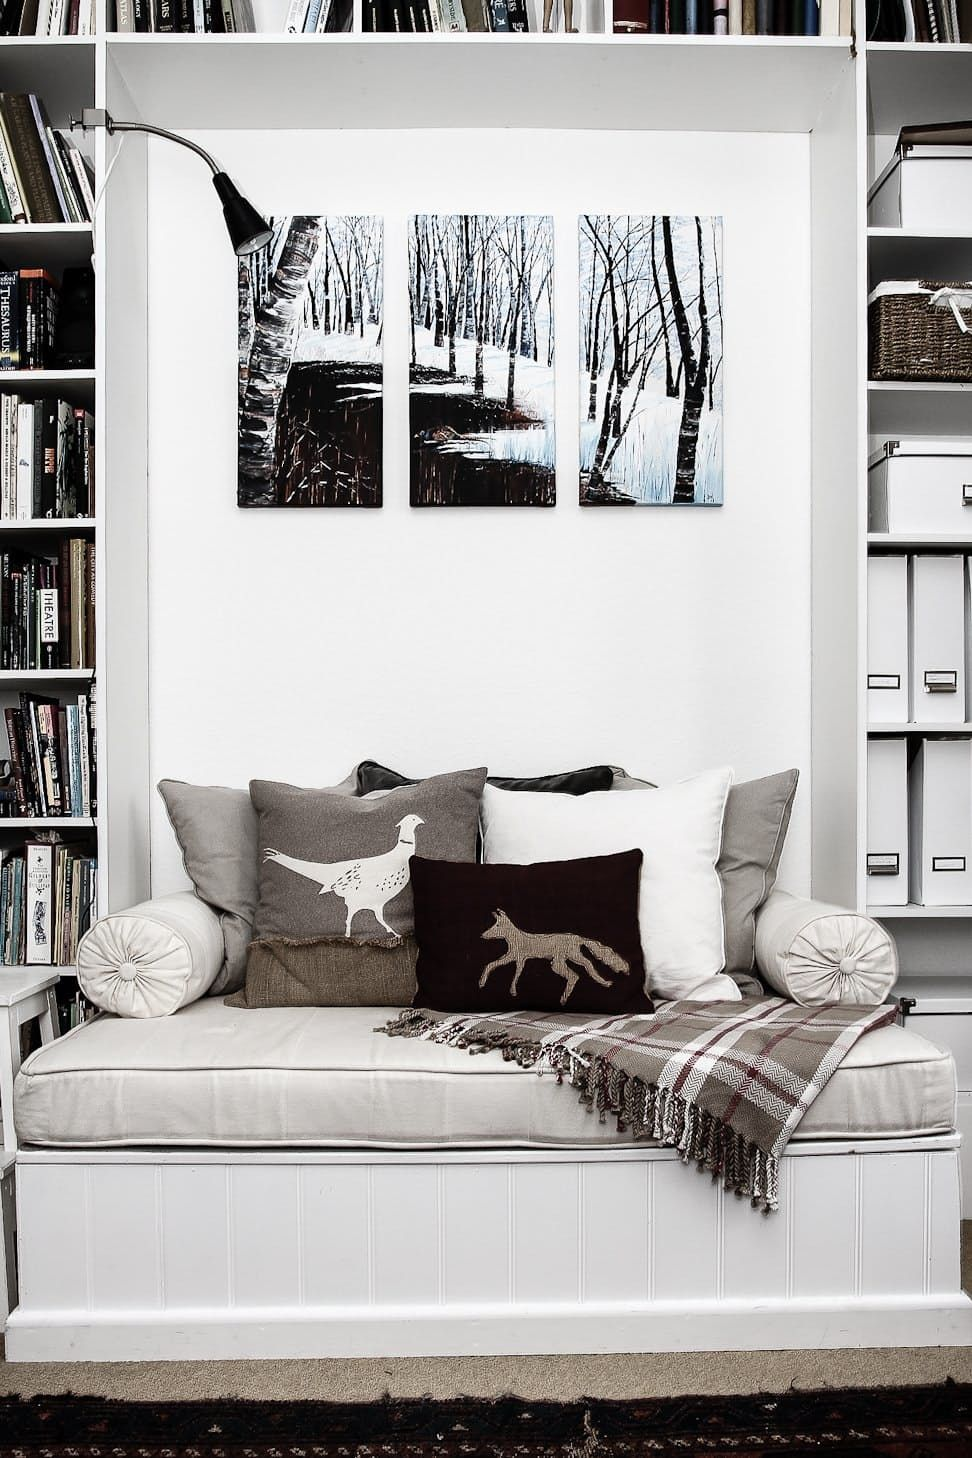 An Ingenious Sofa Bed Alternative Upcycled Foldaway Bed Sofa Bed Alternatives Box Bed Murphy Bed Ikea